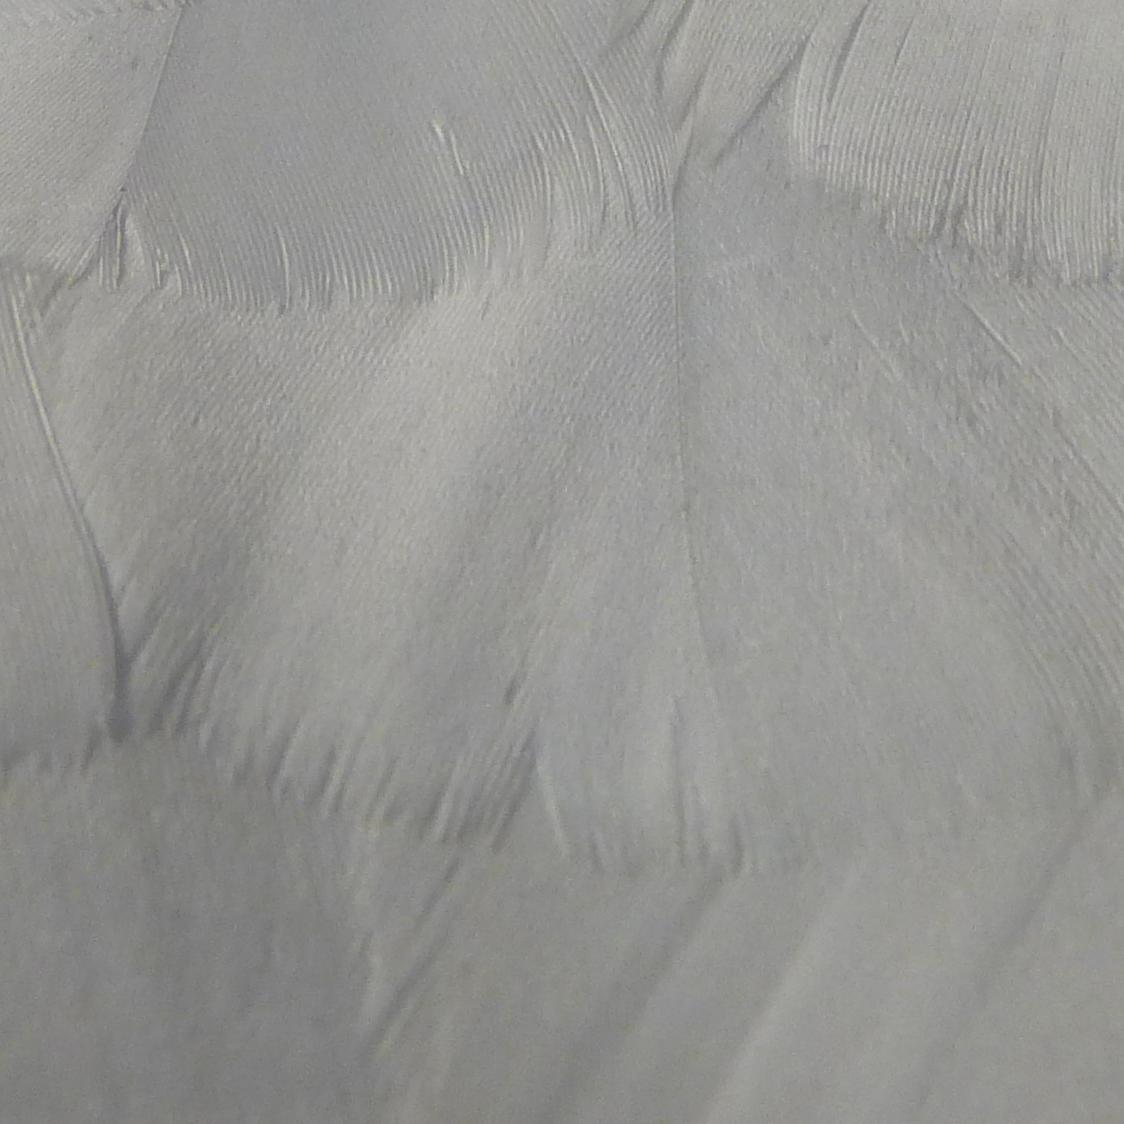 White Surface - Photo 5